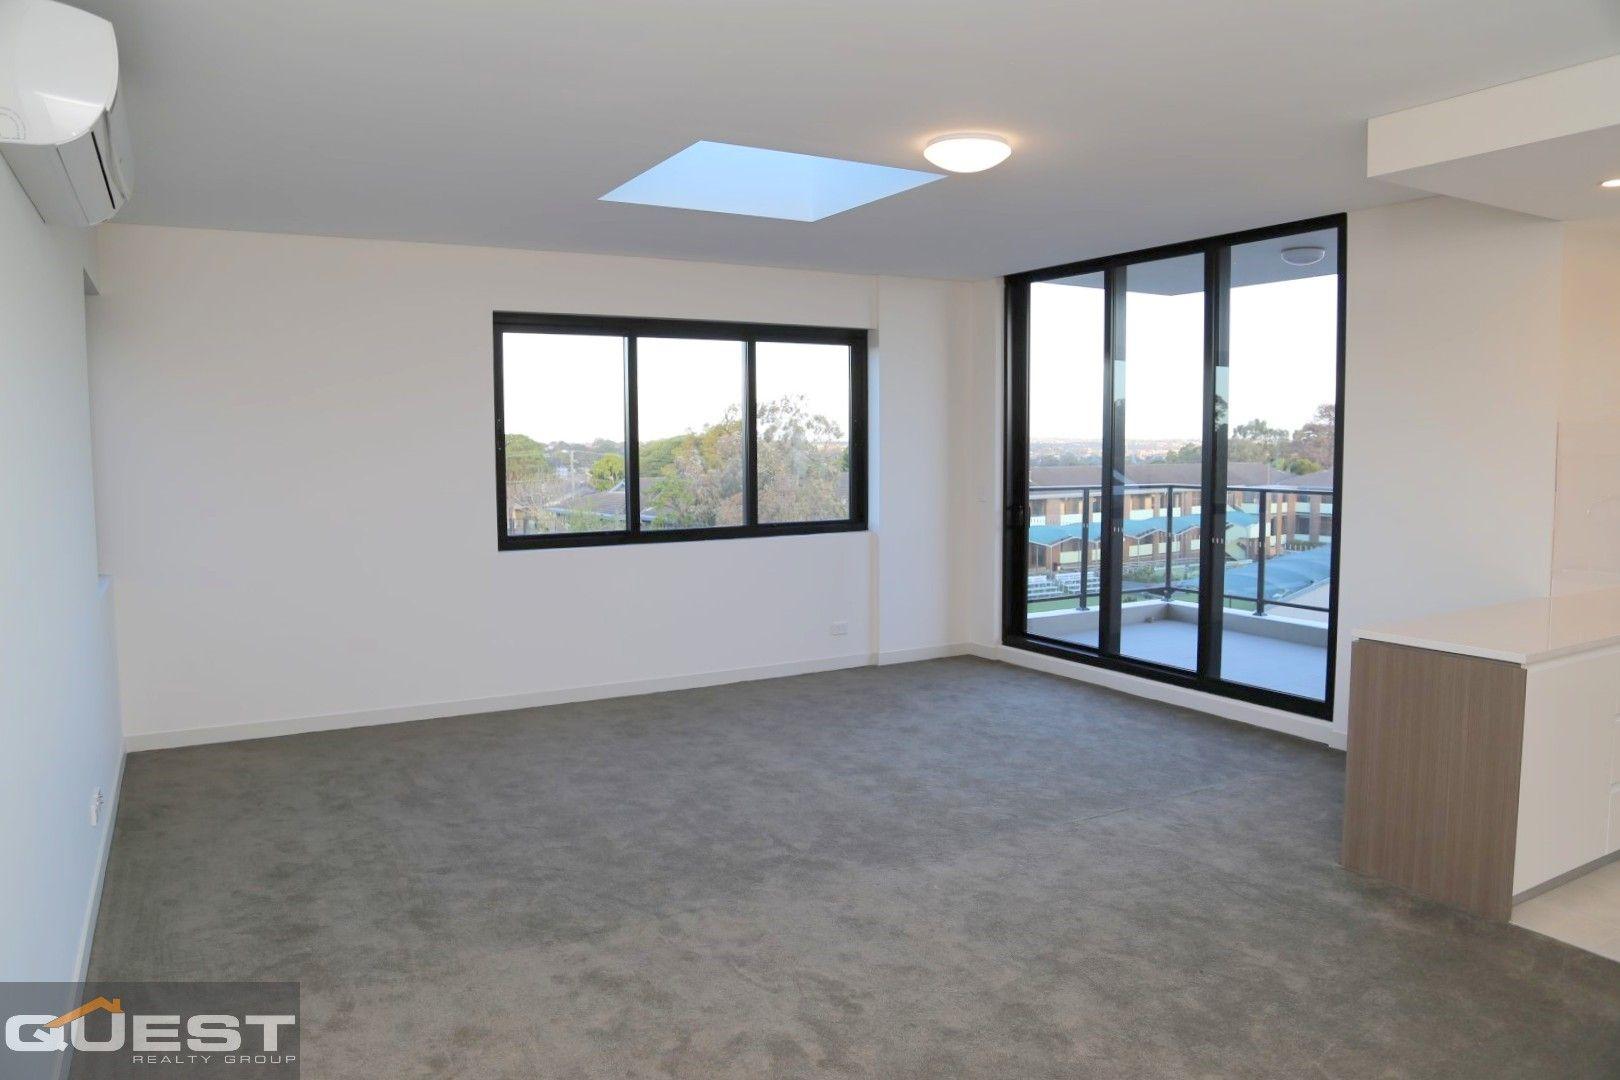 D306/351 Hume Hwy, Bankstown NSW 2200, Image 0